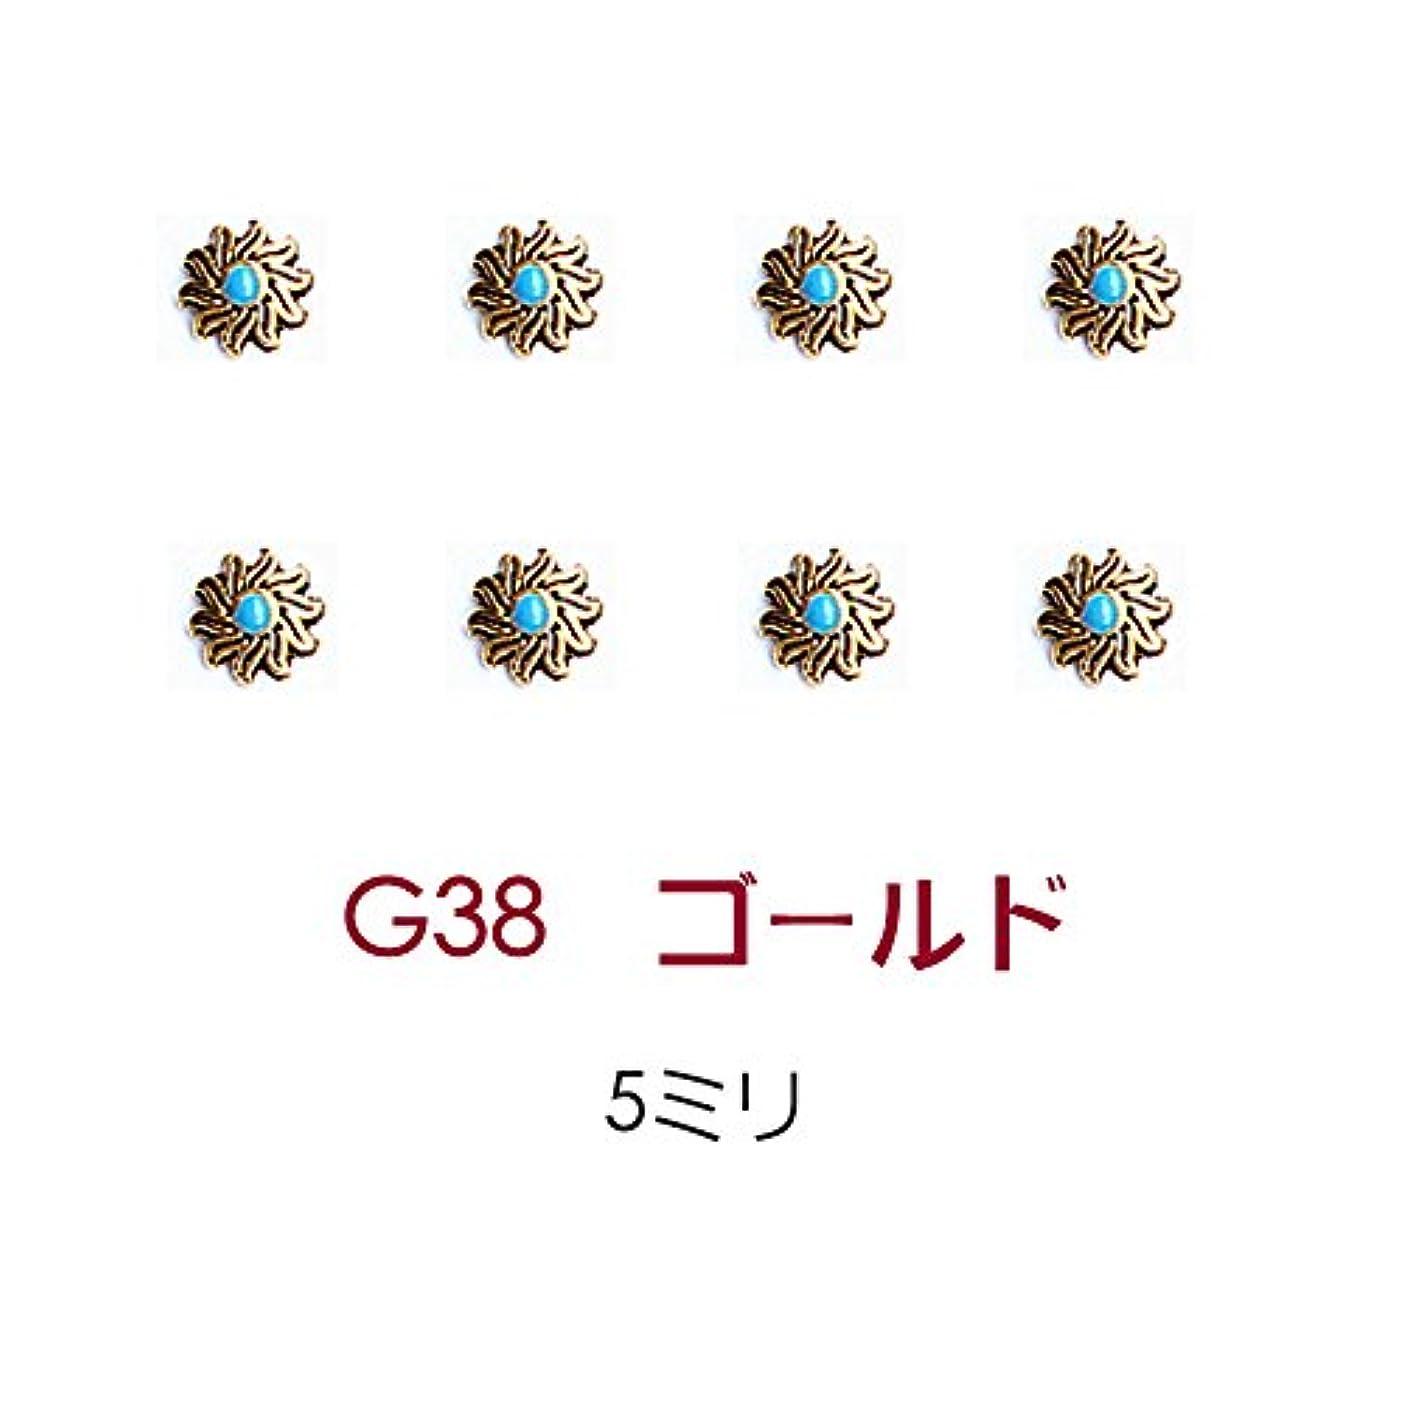 G38(5ミリ) ゴールド 8個入り メタルパーツ コンチョ ターコイズ風 ゴールド シルバー ネイルパーツ スタッズ ネイル用品 GOLD SILVER アートパーツ アートパーツ デコ素材